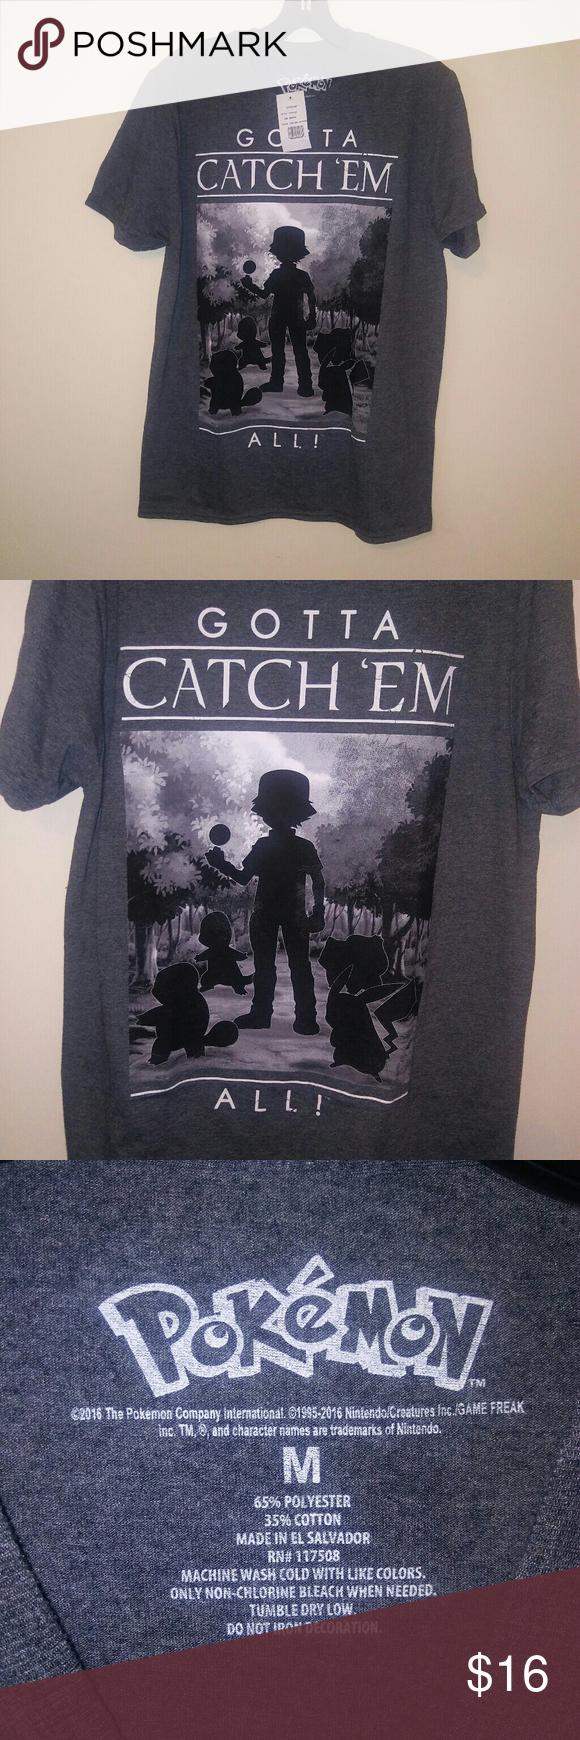 c26f4b51 Pokemon Gotta Catch'em All Mens Medium Shirt New with tags, 19.5